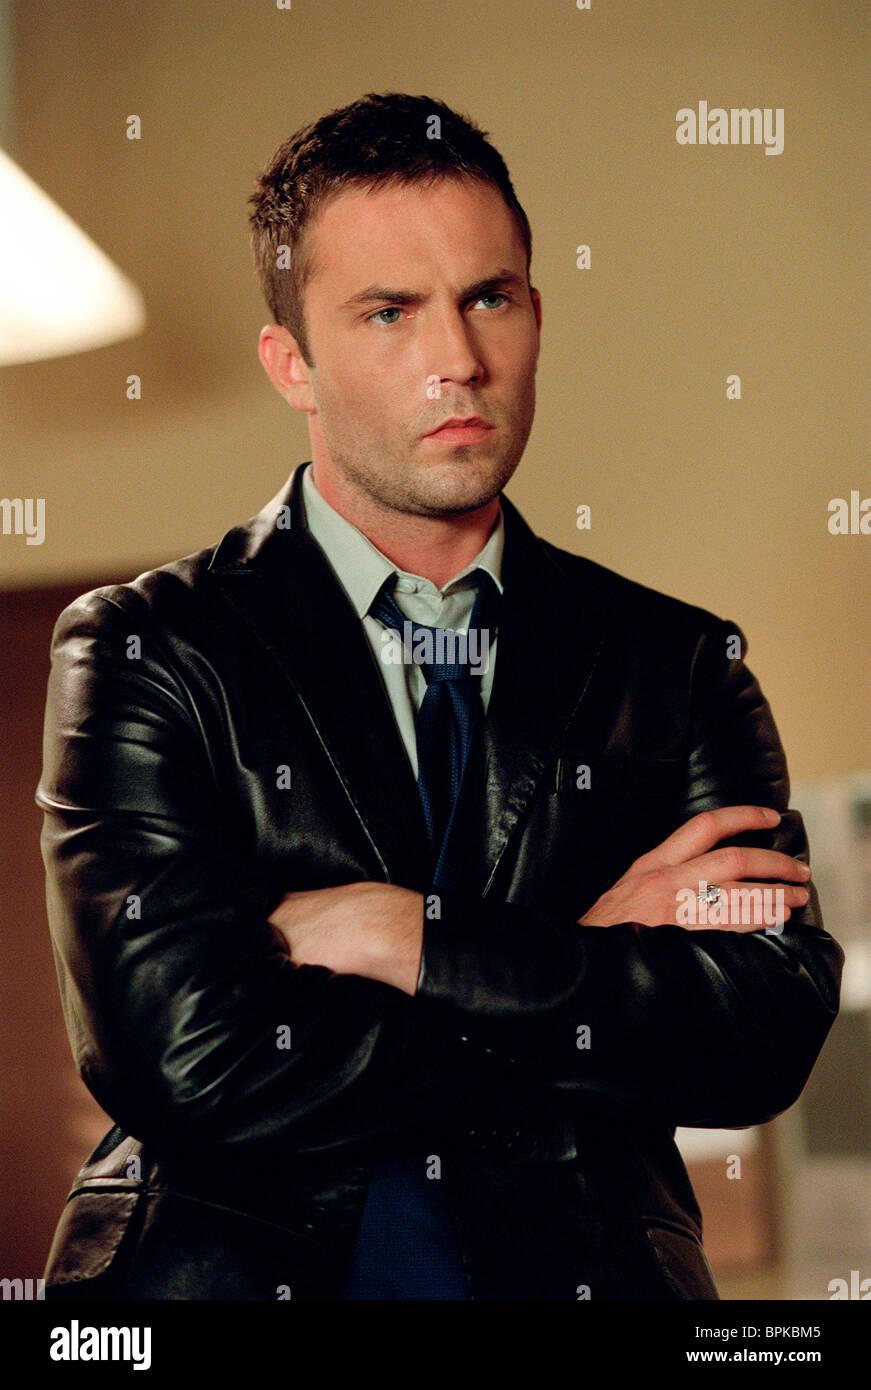 Leather jacket decade - Dragnet Desmond Harrington